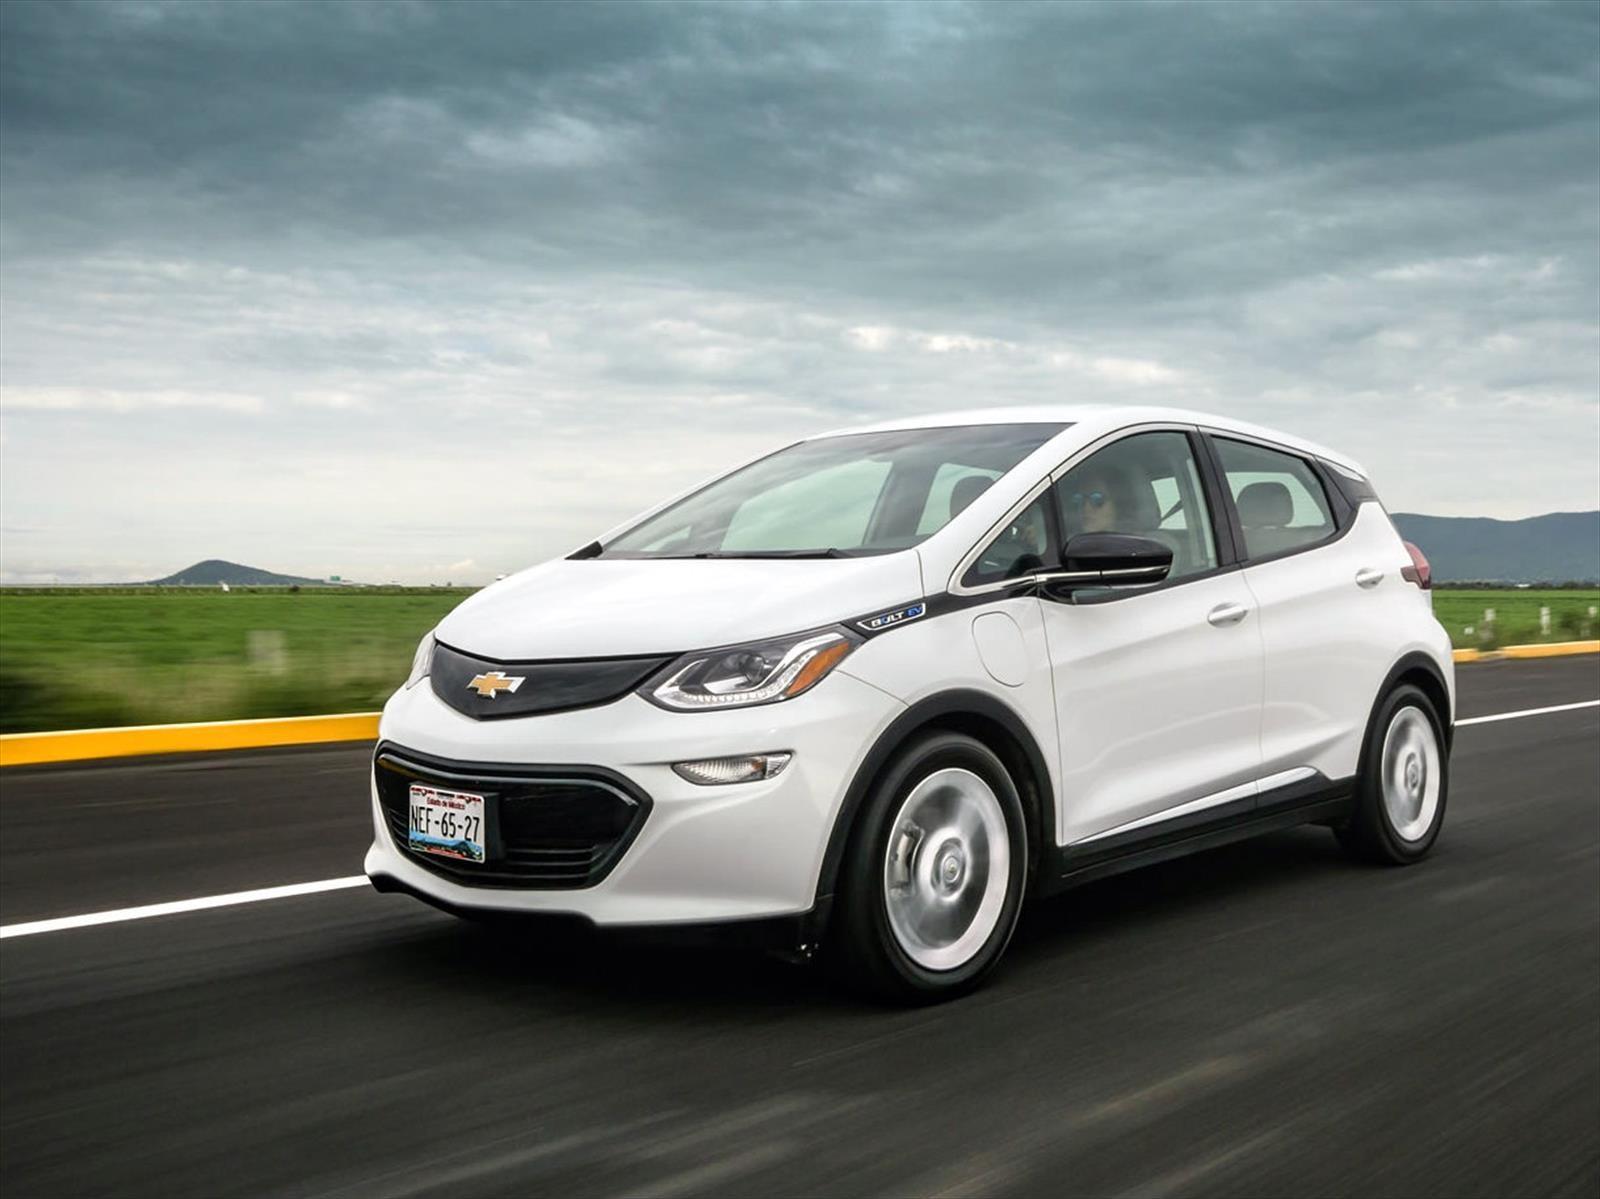 Chevrolet Bolt EV 2017: test drive